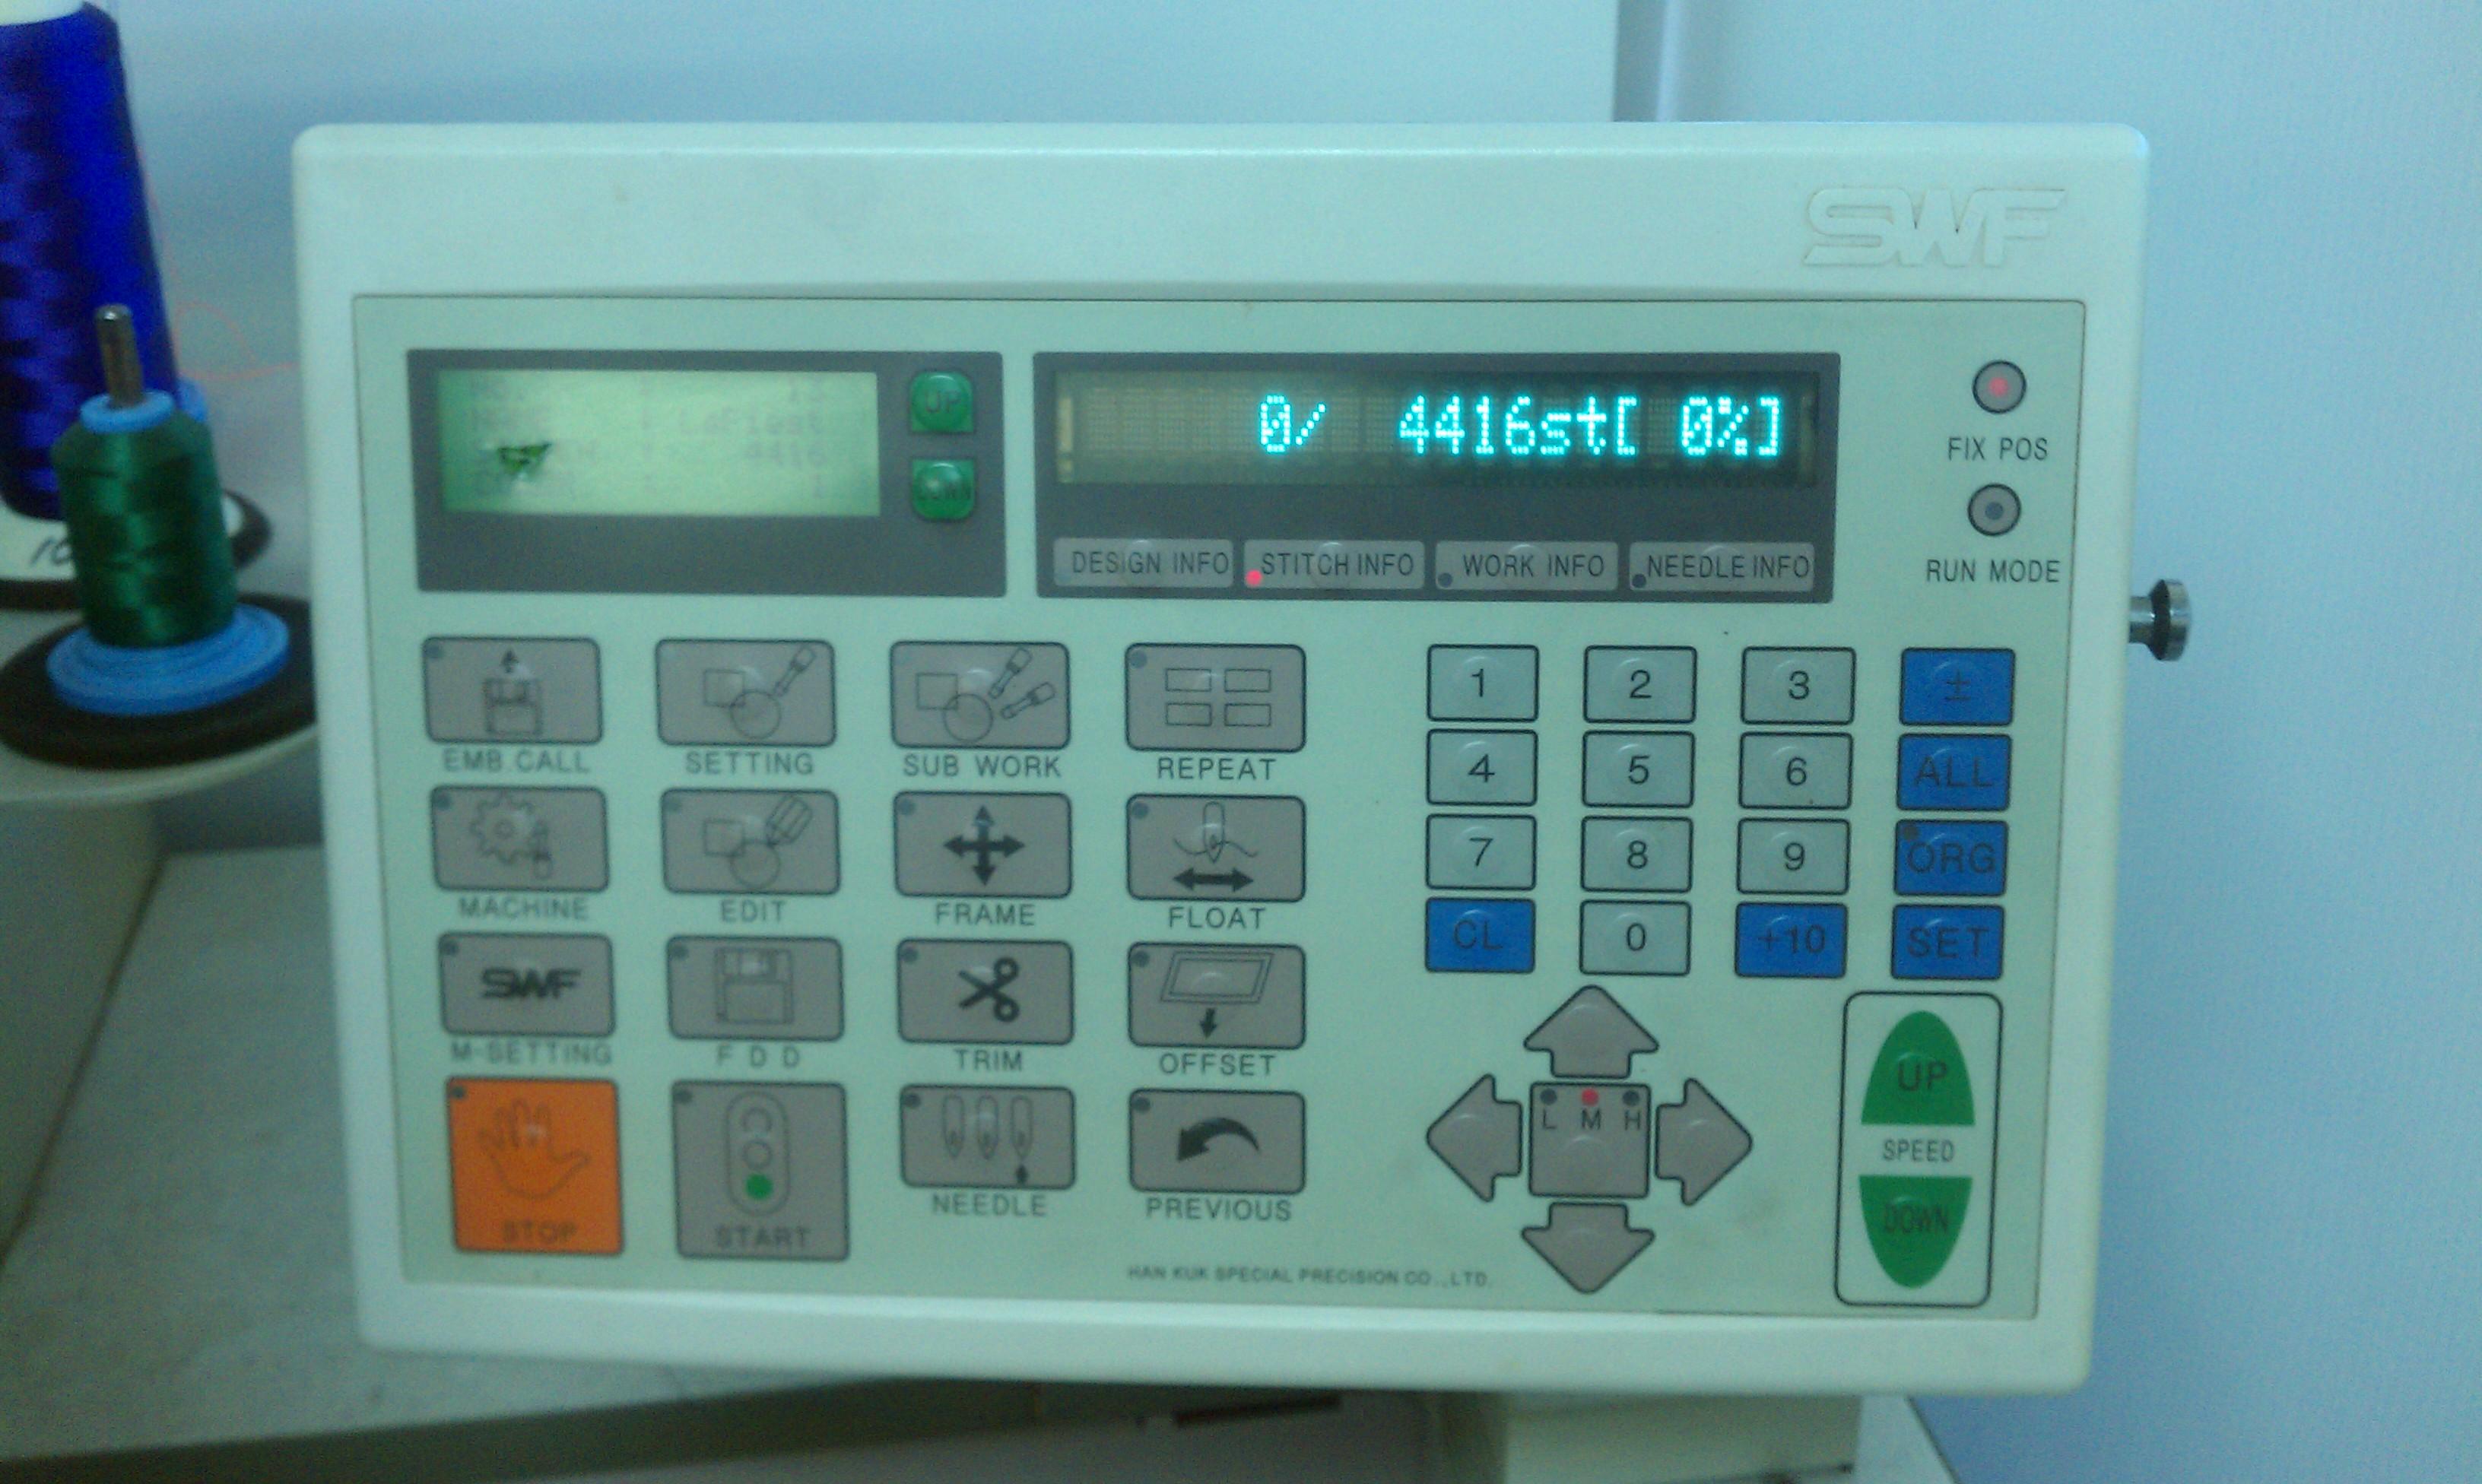 swf single head embroidery machine 12 needle extras 8500